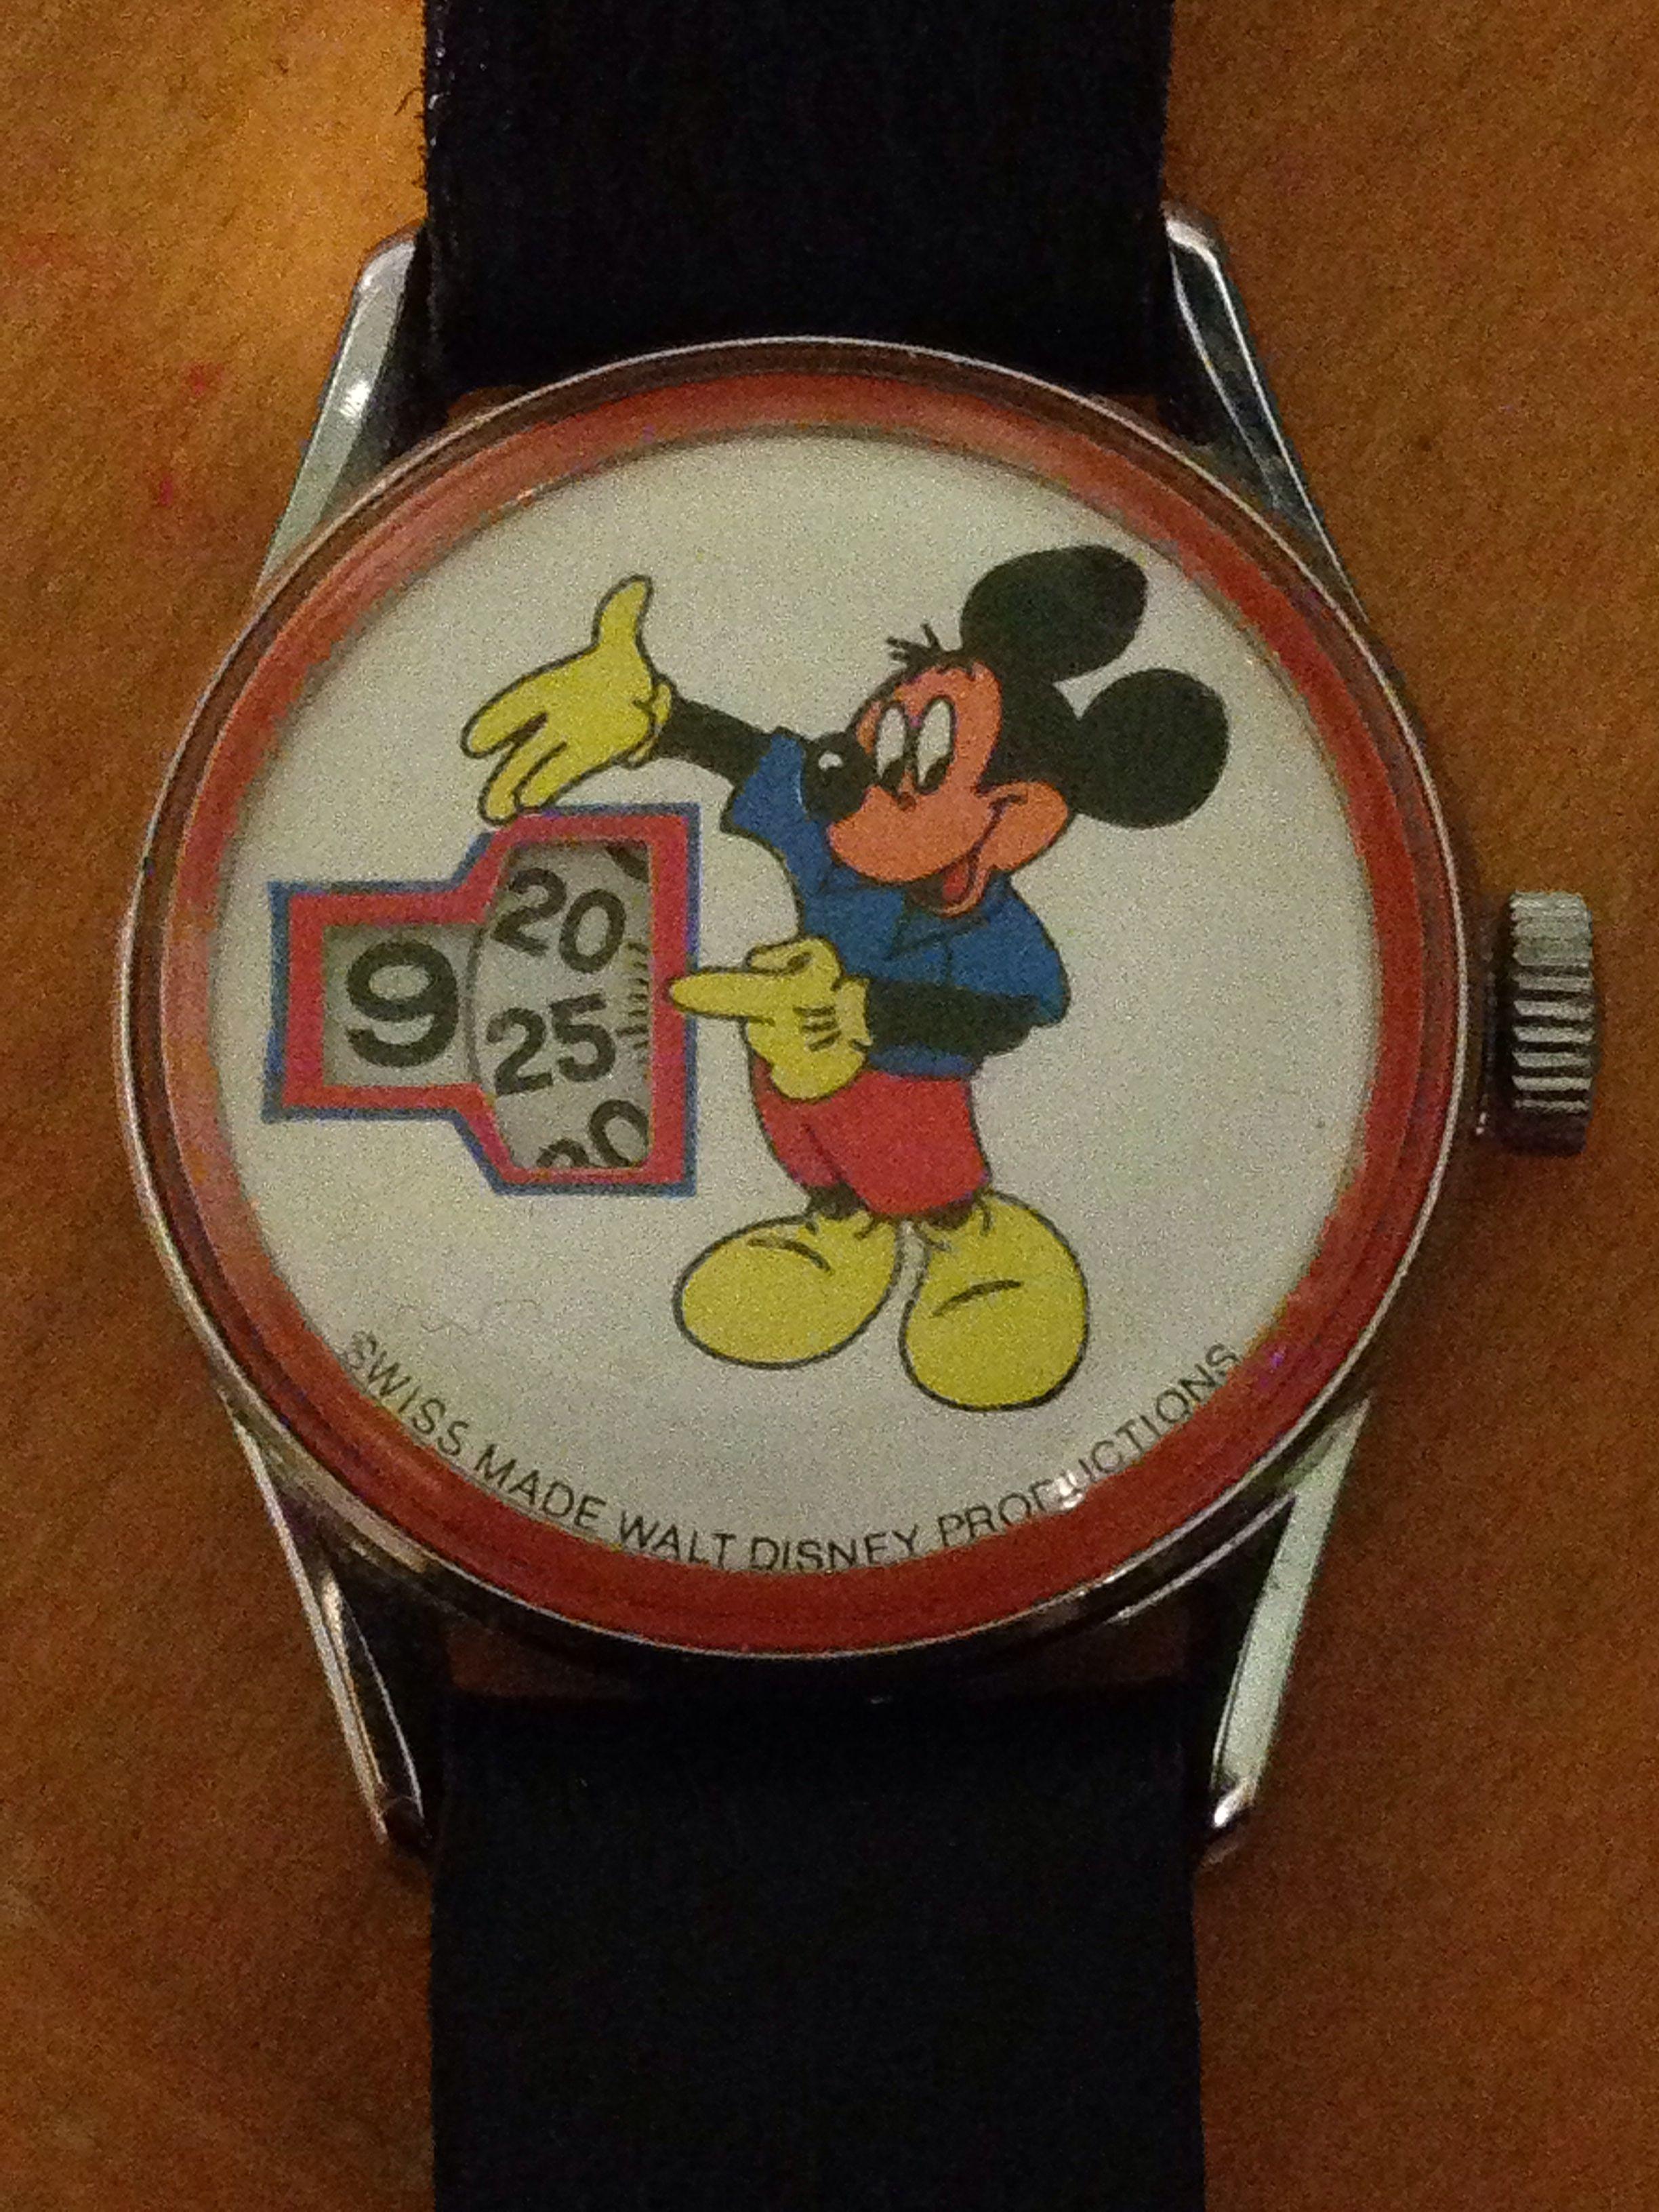 adf99e3f3 Super #rare #vintage #swiss made #Walt #Disney productions #MickeyMouse jump